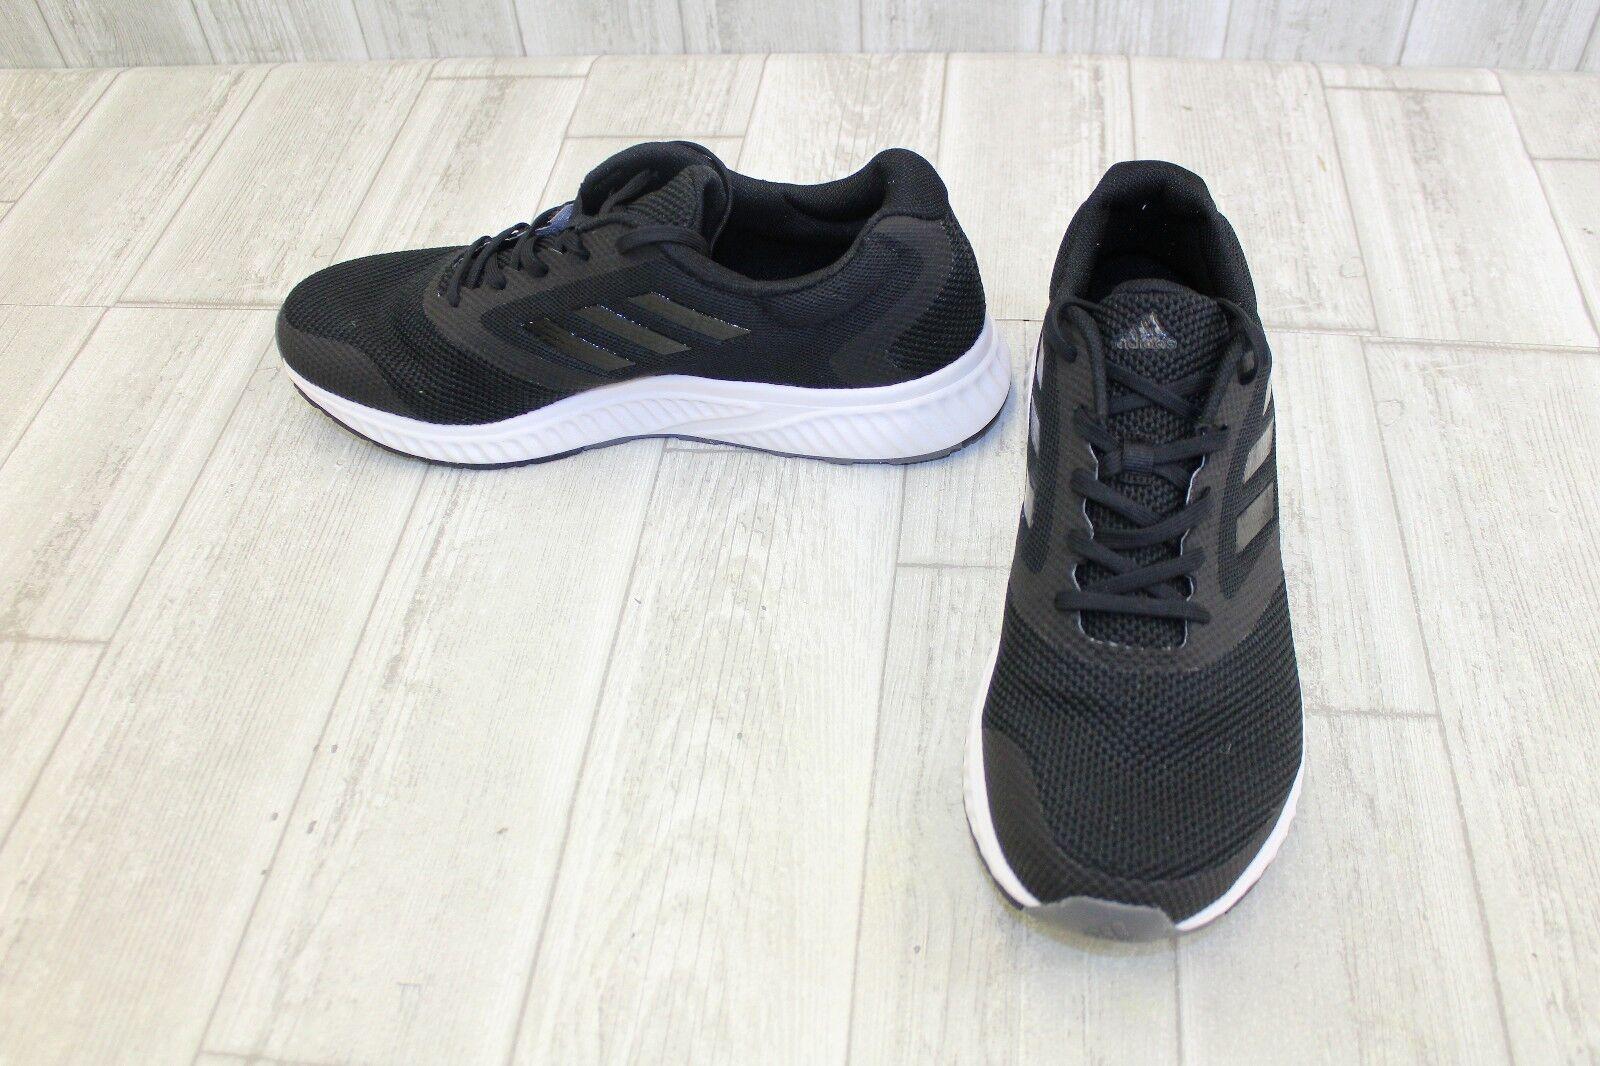 Adidas Edge Racer Shoes Hombre Hombre Shoes comodo Wild Casual Shoes 034265